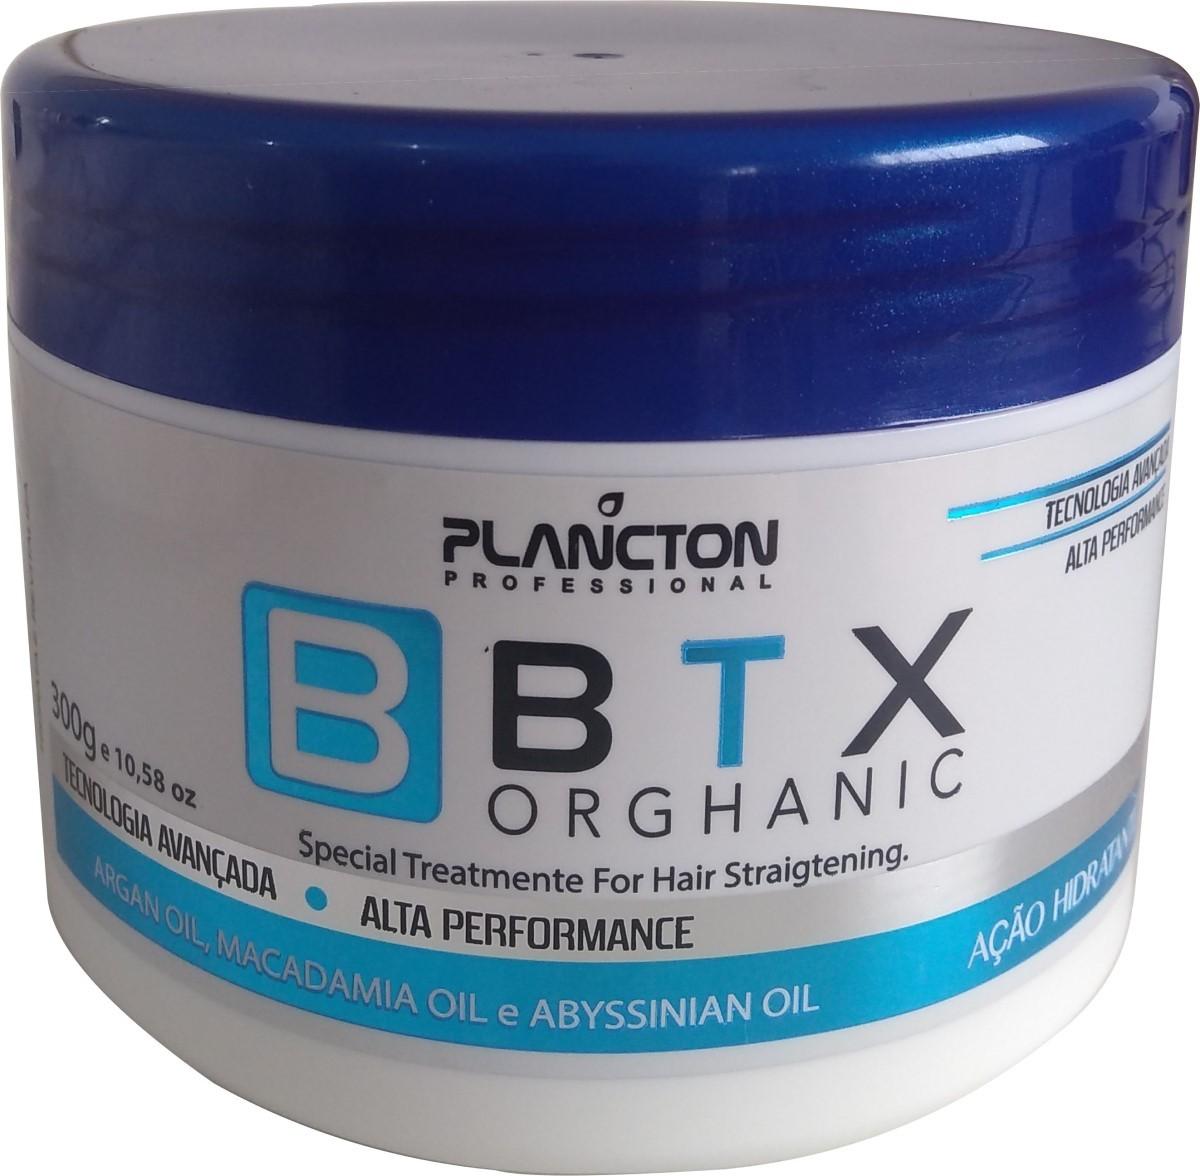 Btx Organico Plancton 300g - Sem Formol